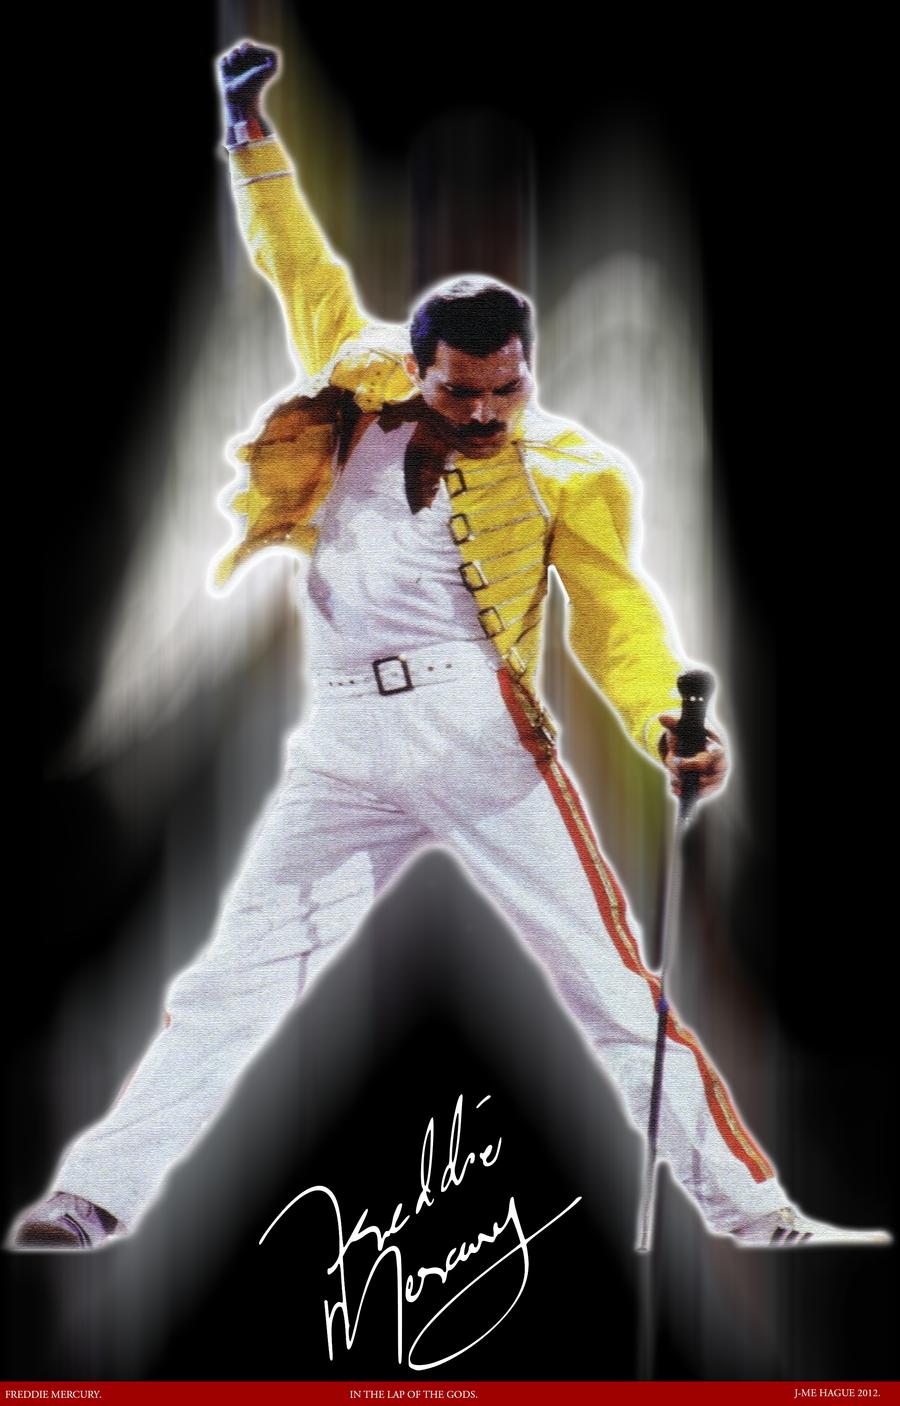 Freddie Mercury In The Lap Of The Gods By Jmehague13 D5gwe7s Png 900 1406 Freddie Mercury Queen Freddie Mercury Mercury